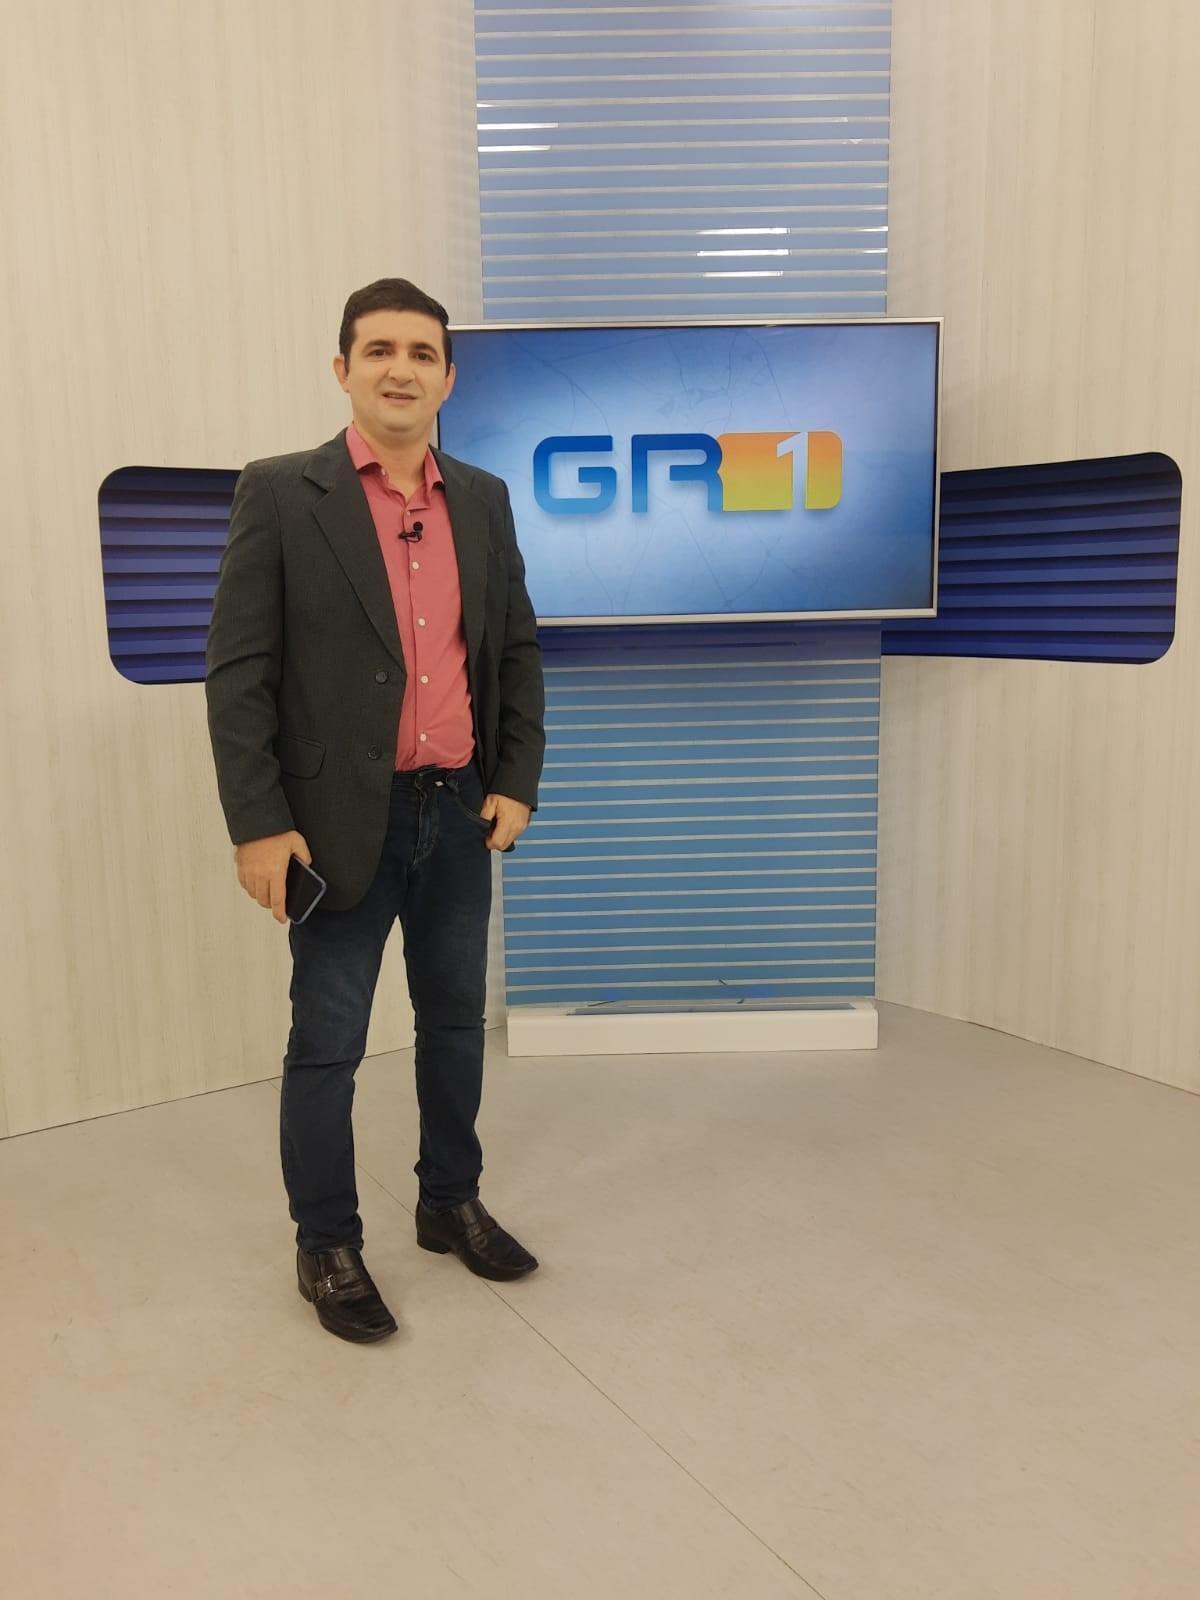 AO VIVO: Assista ao GR1